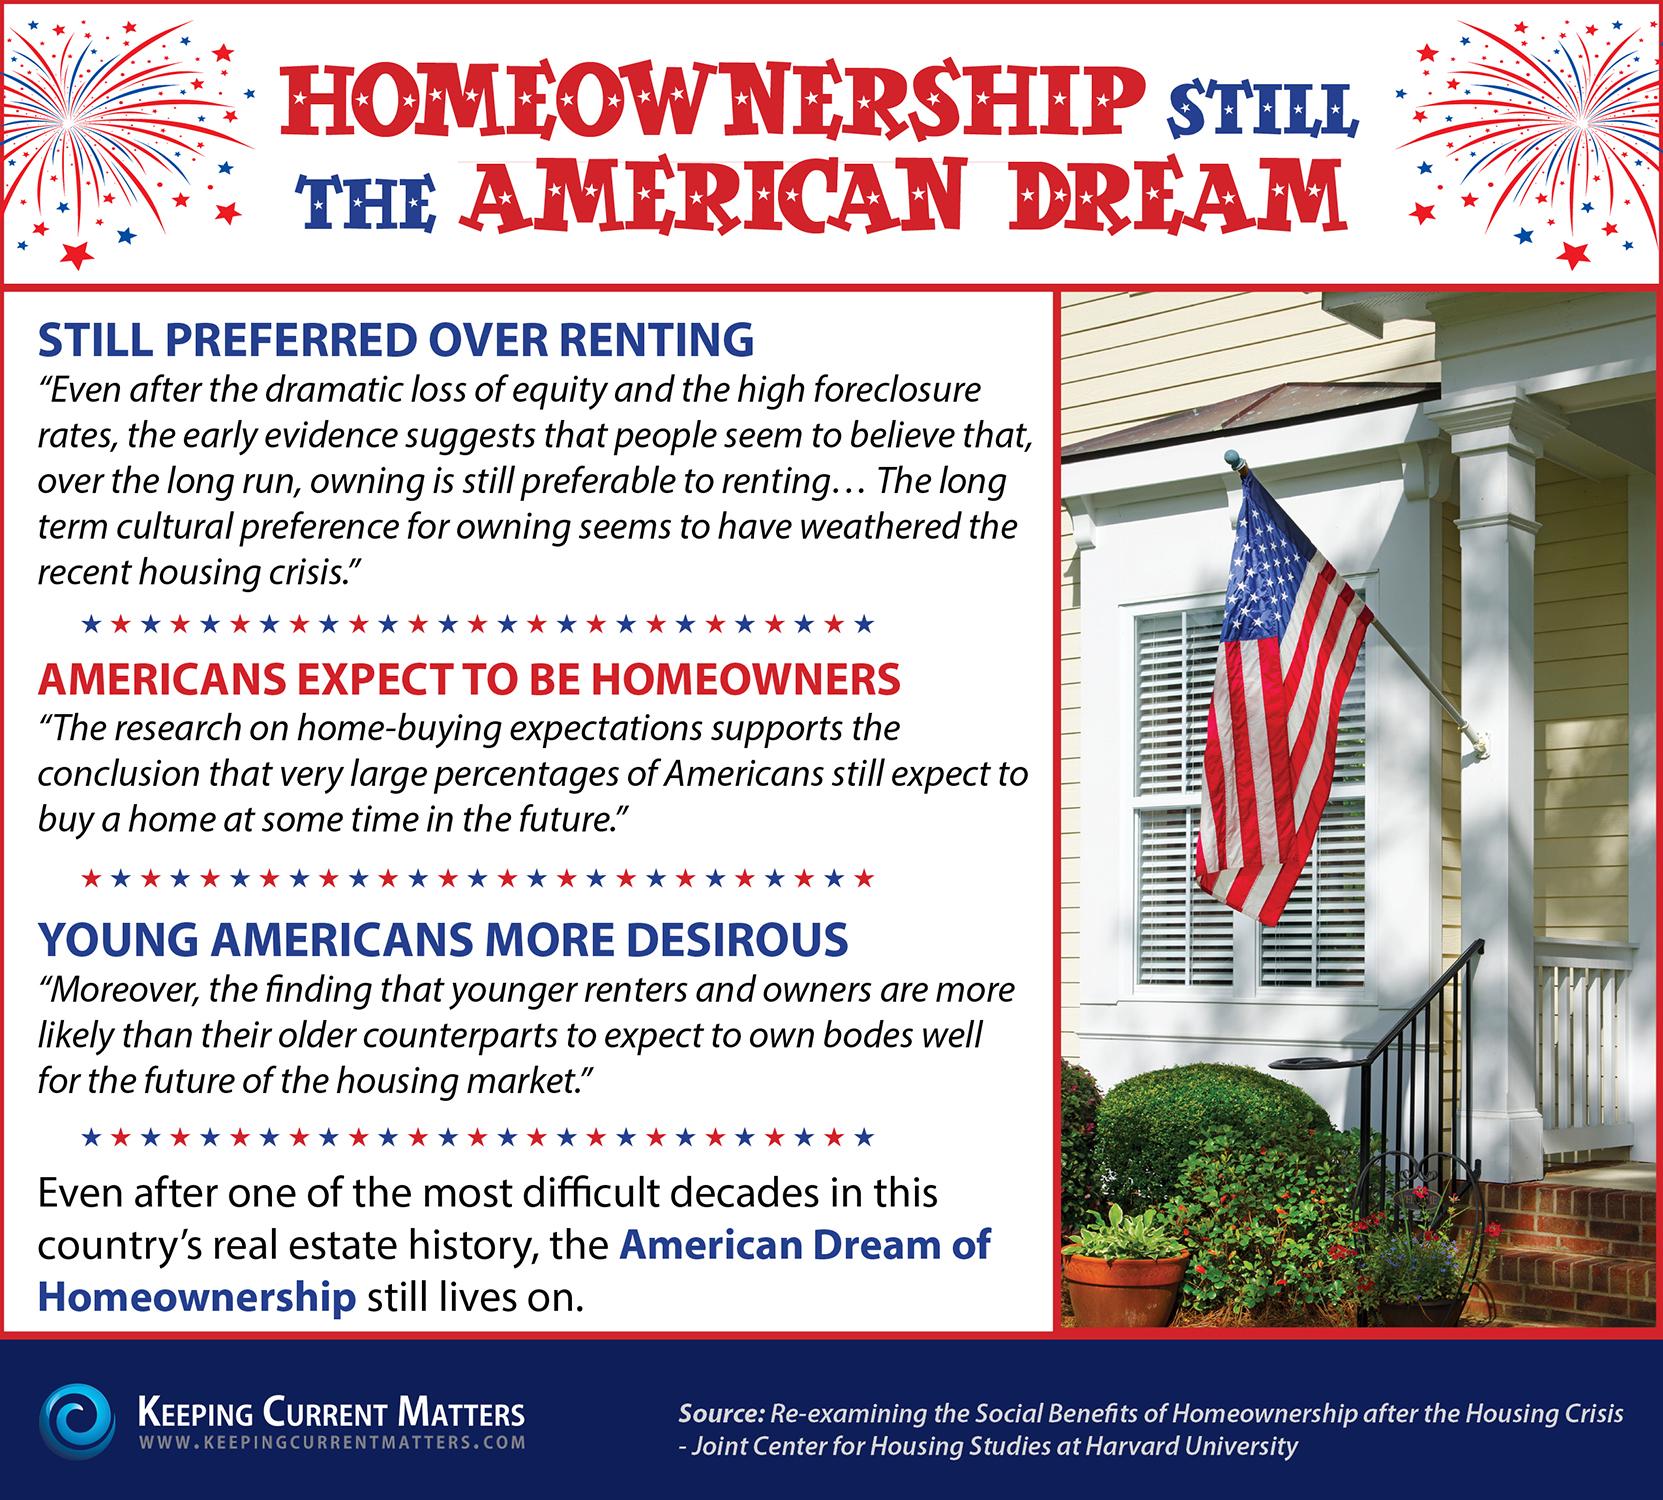 Homeownership Still the American Dream | The KCM Crew